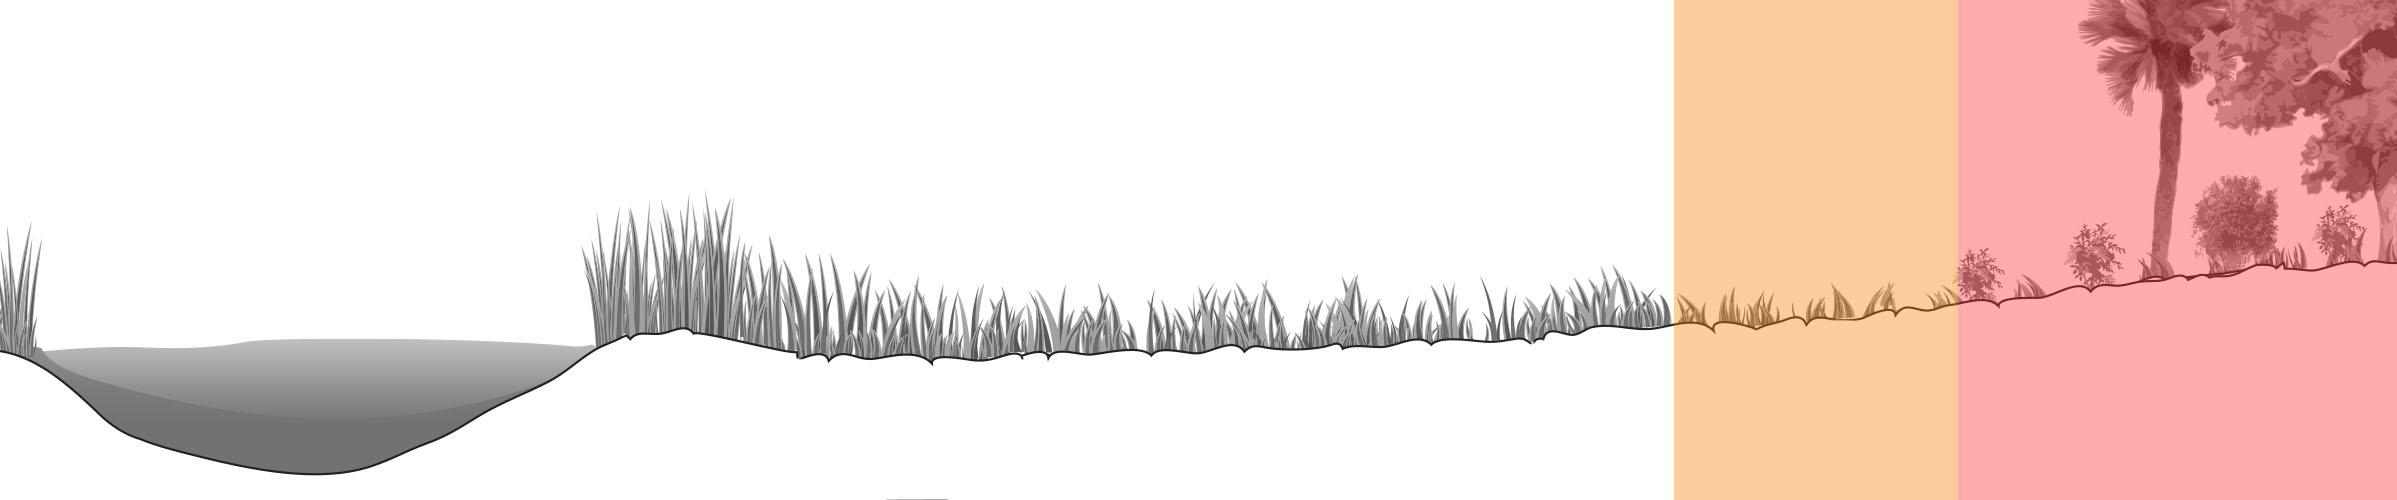 Upland high graph